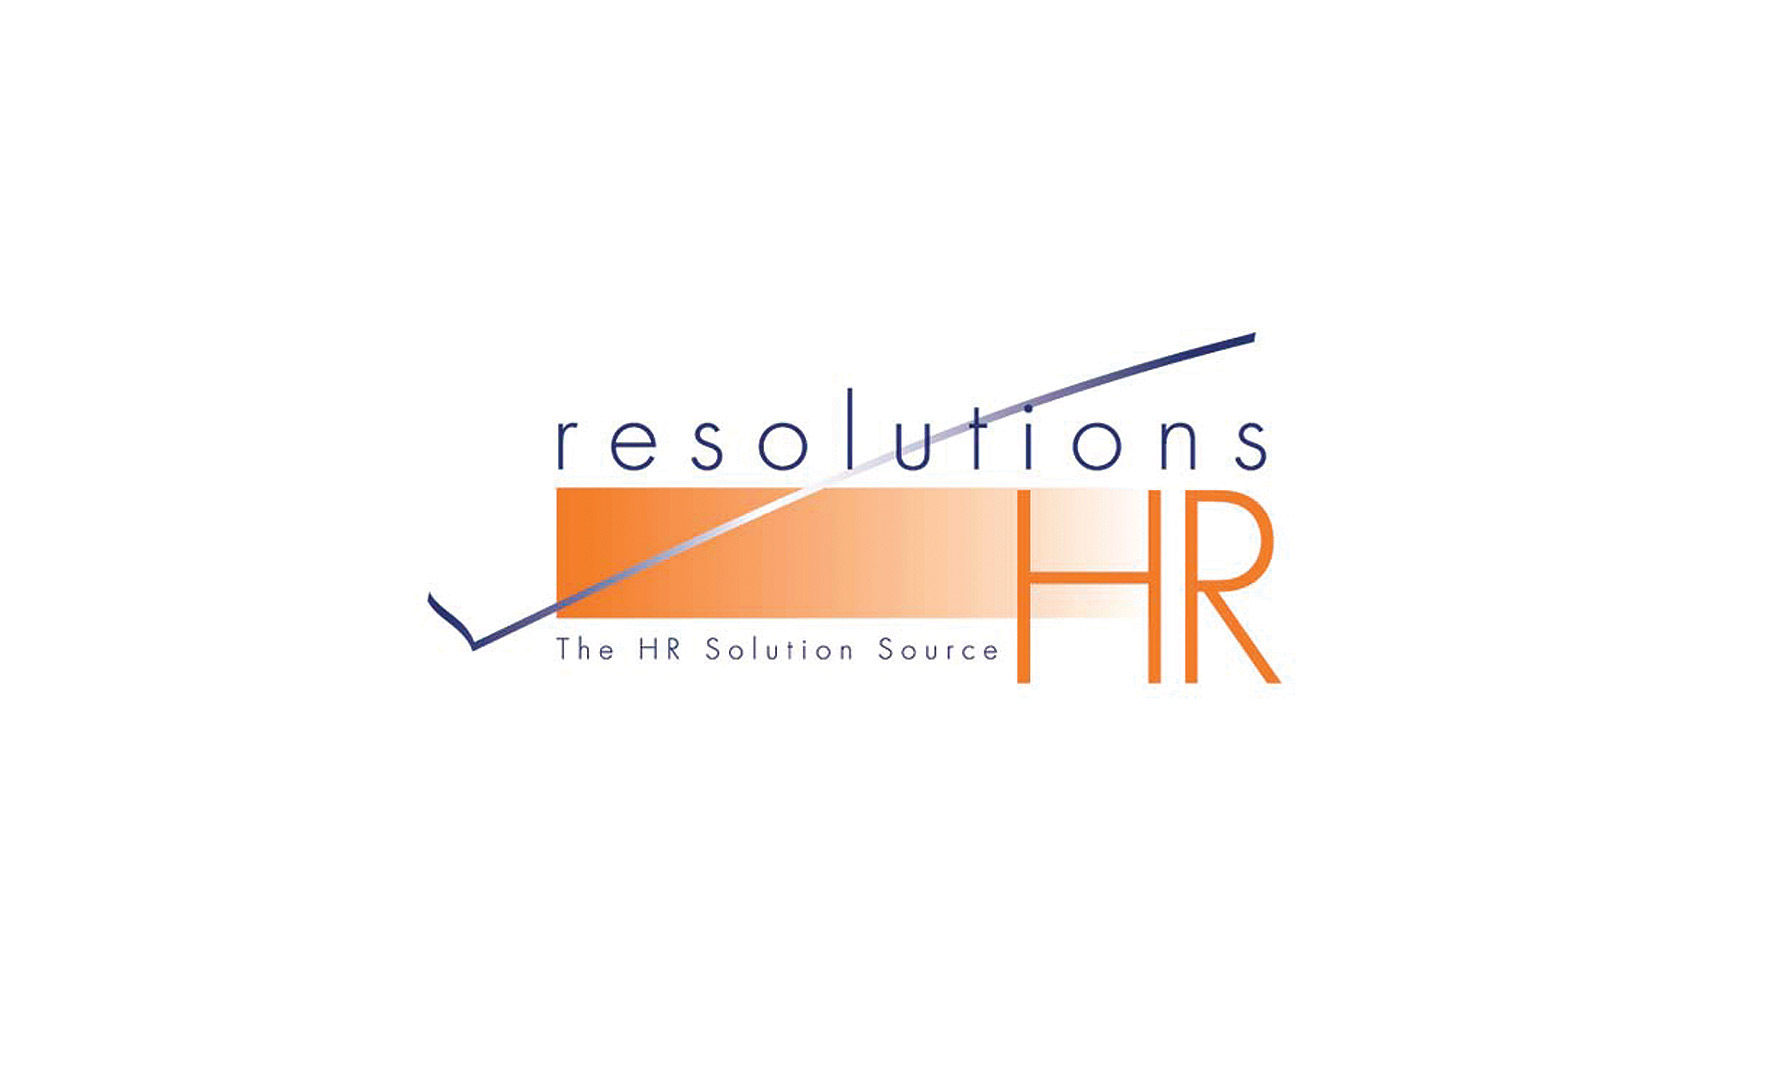 logo design, branding, ad agency, advertising agency Houston, seo company Houston, website design company houston